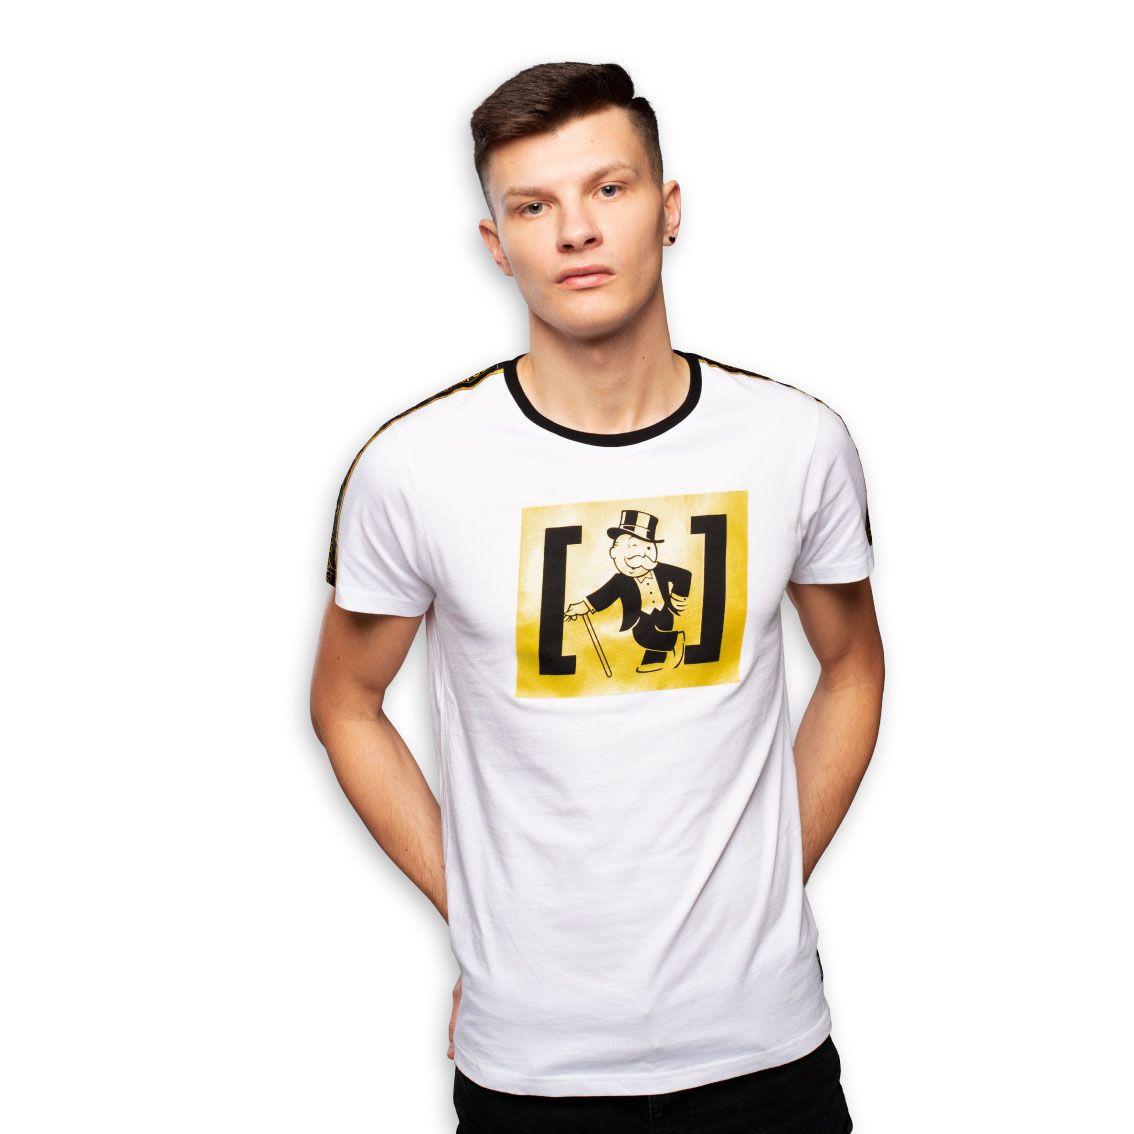 T-shirt homme monopoly rich blanc (photo)